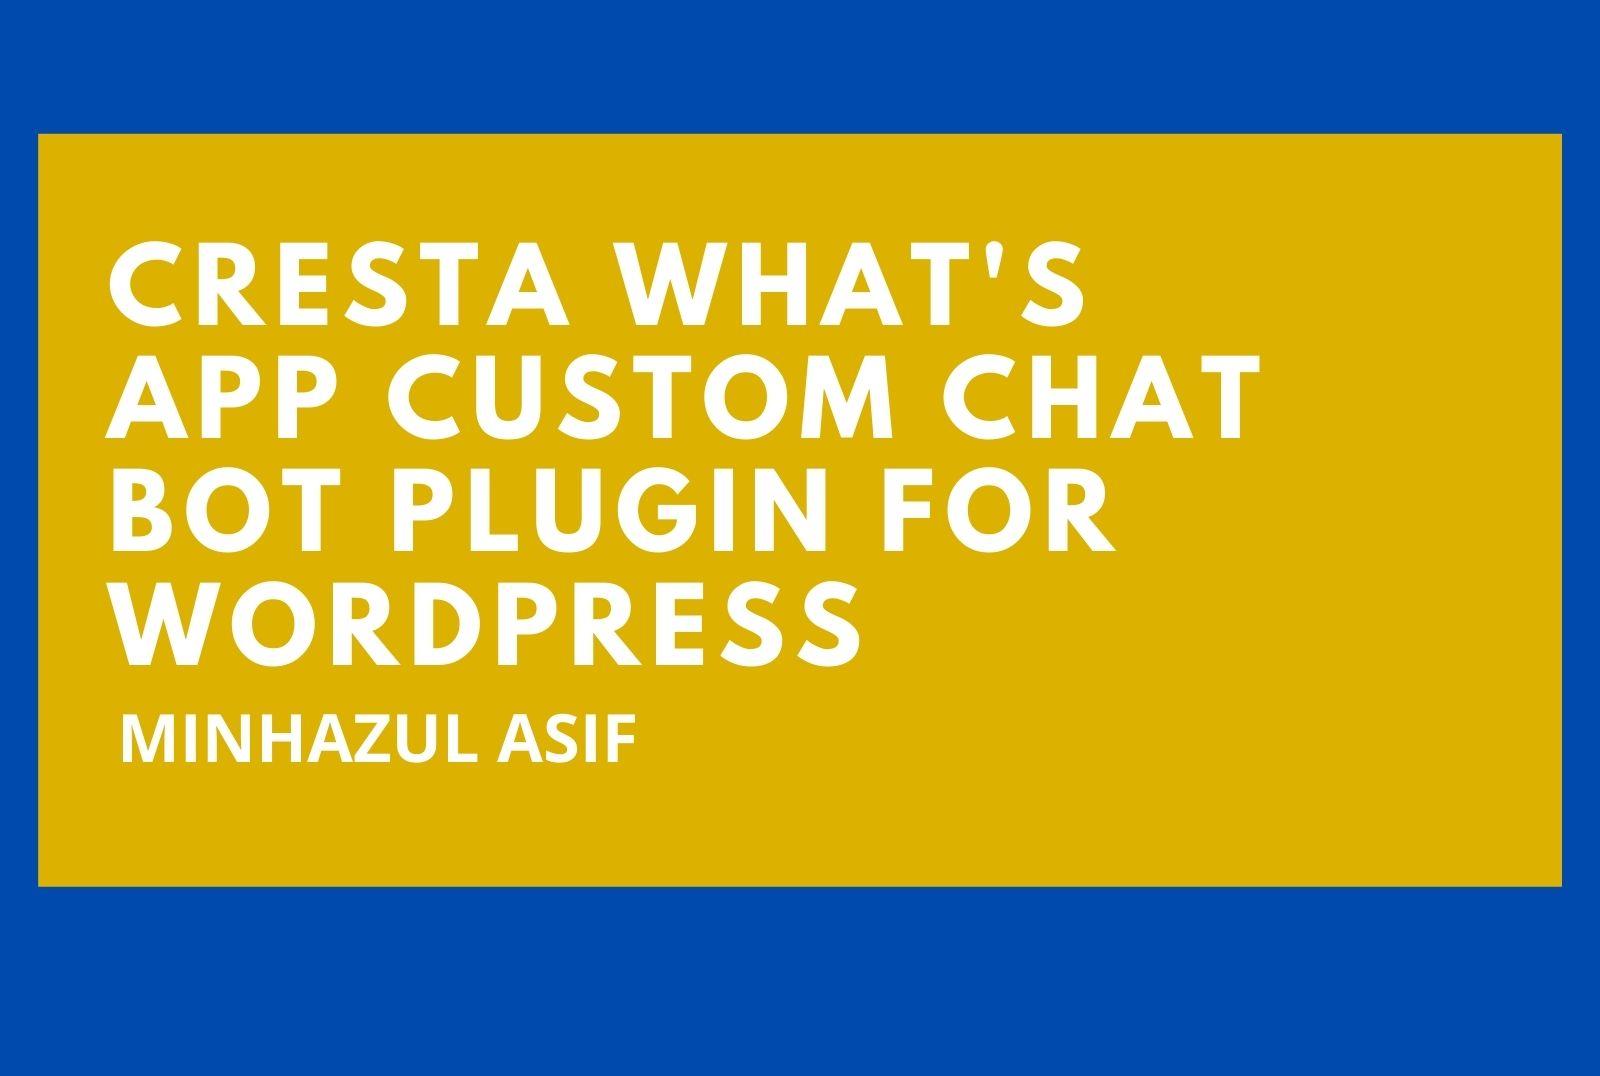 Cresta What's APP Custom Chat Bot Plugin for wordpress